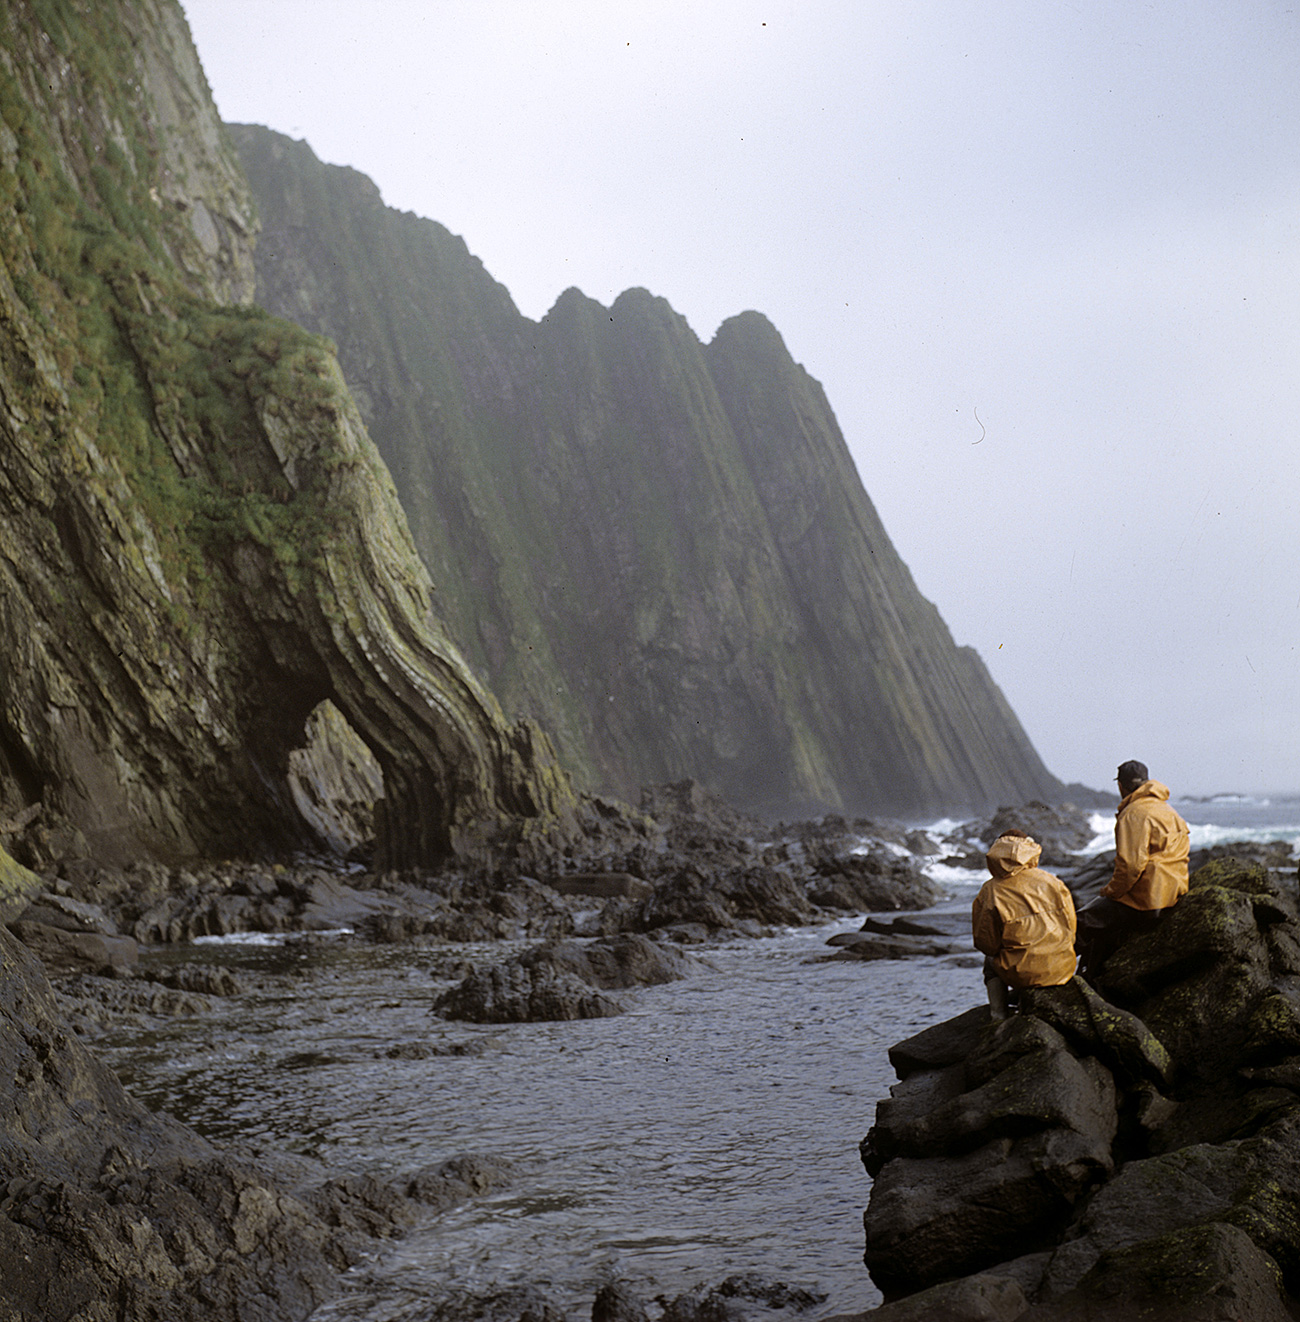 Острво Менди, Командорска острва, Берингово море. Извор: A. Kибалчич/Риа Новости